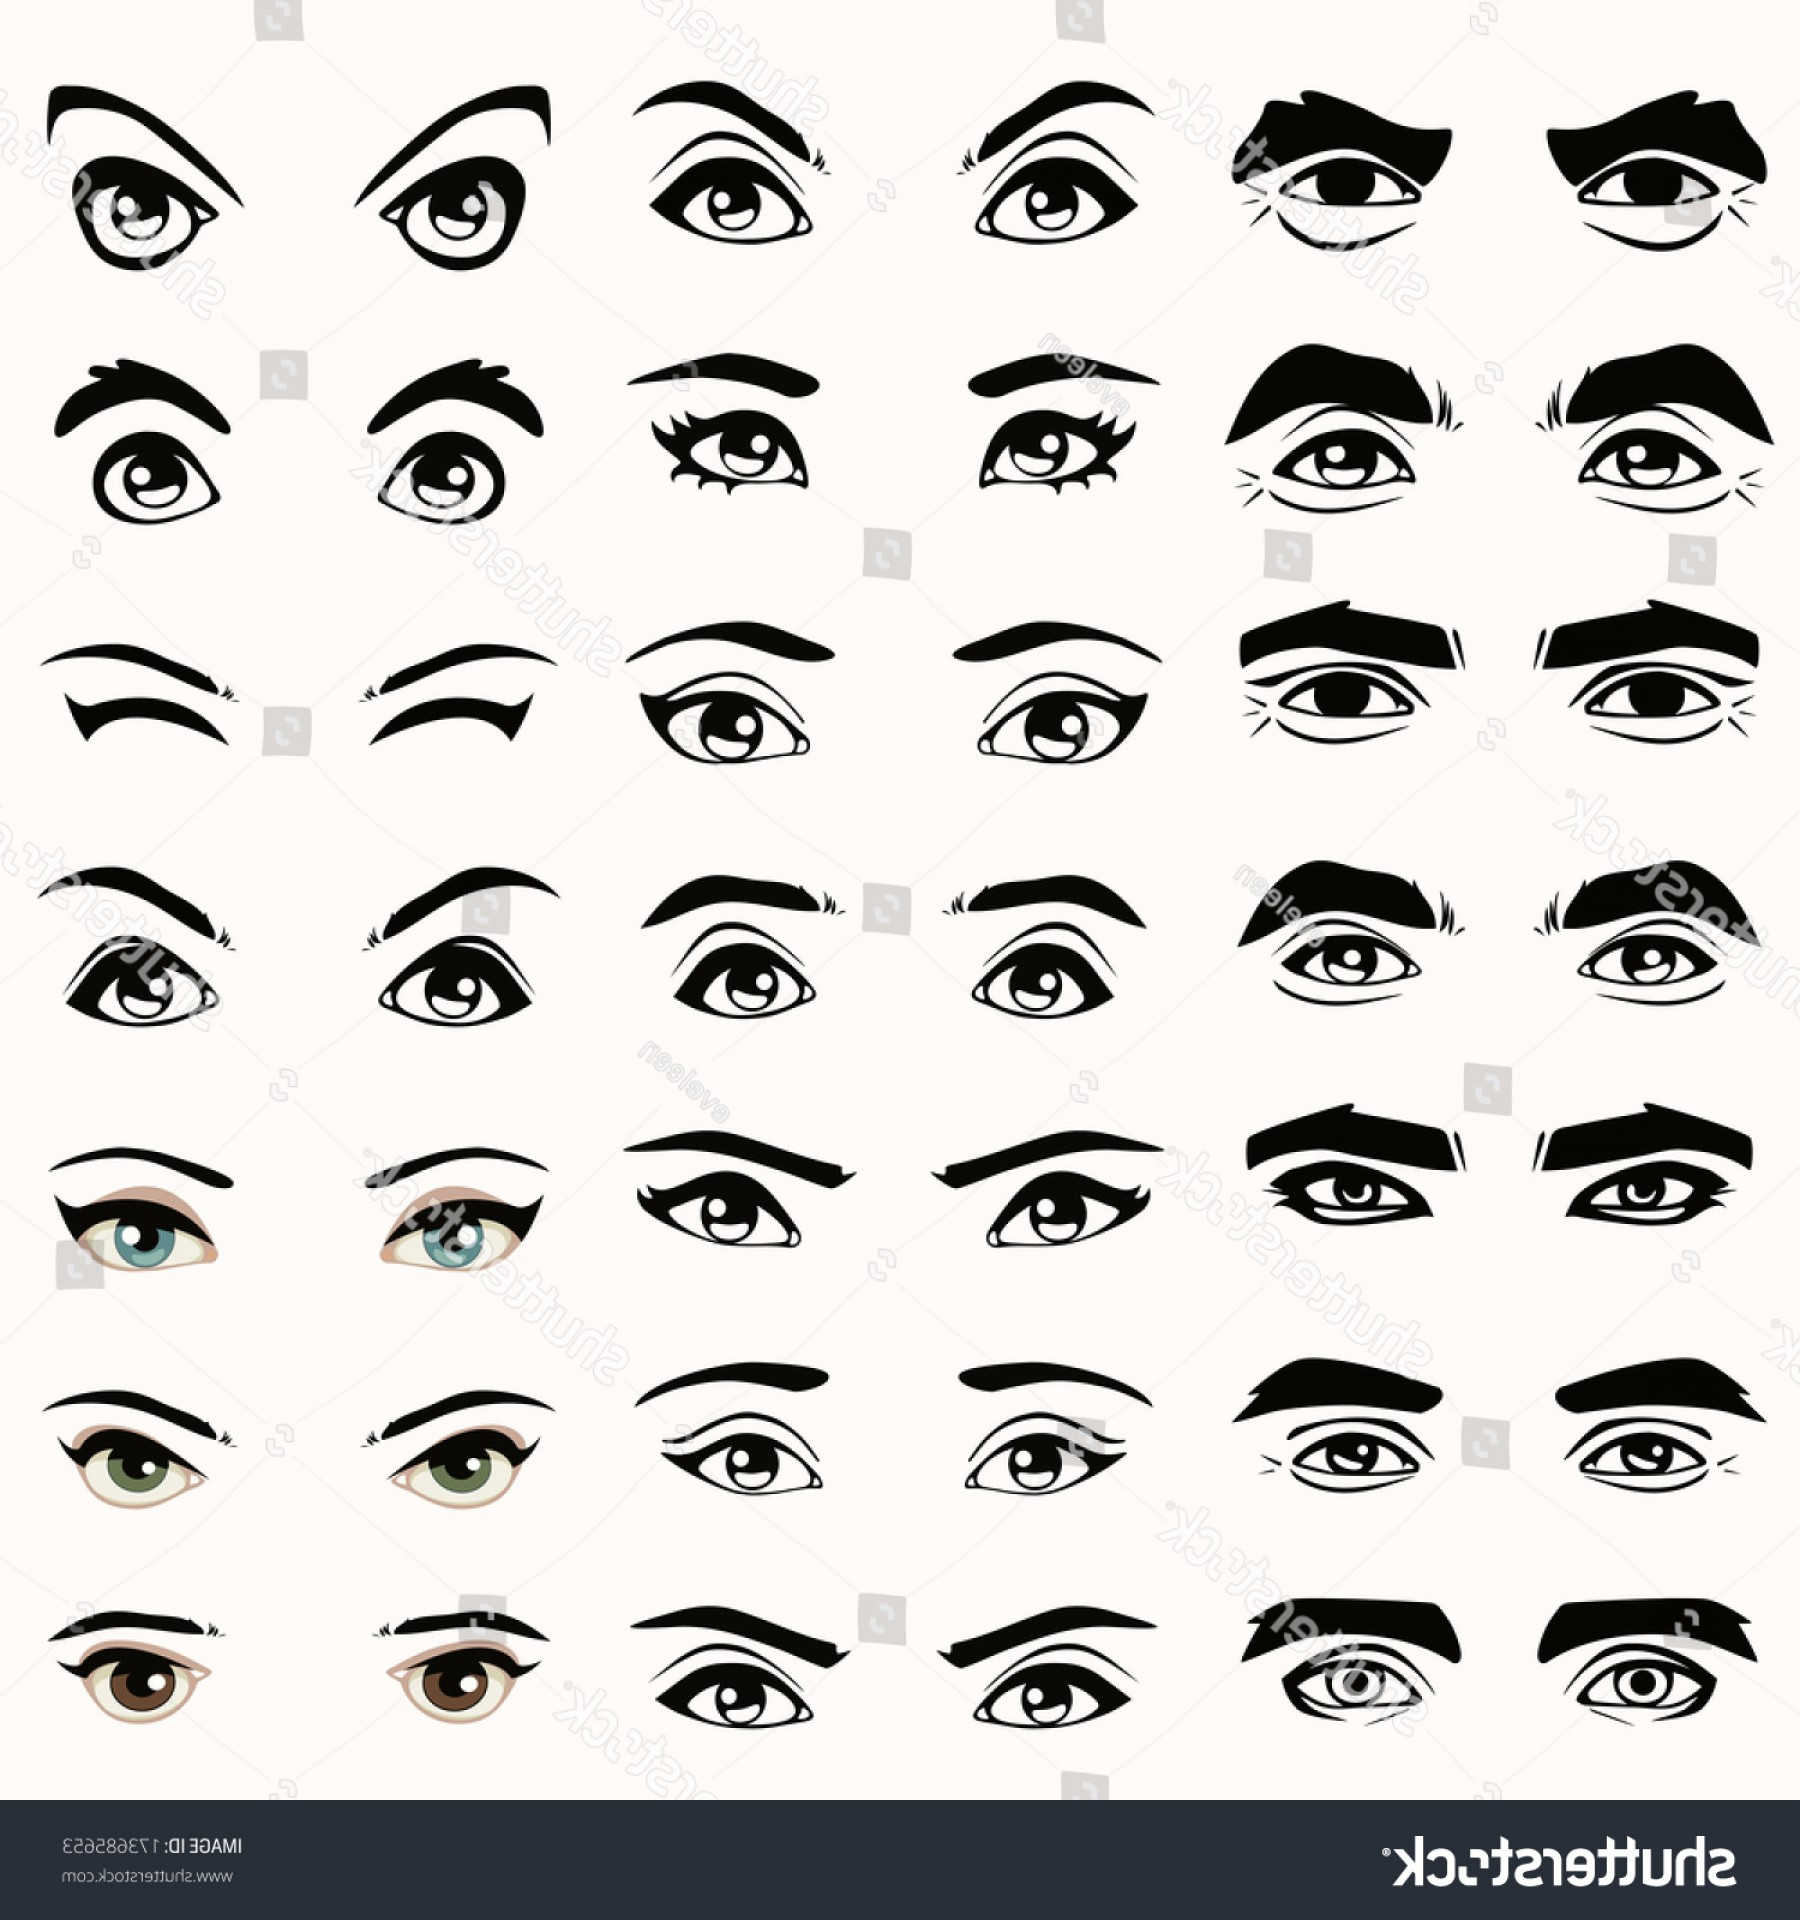 1800x1920 Man Woman Isolated Vector Eyes Eyebrows Shopatcloth